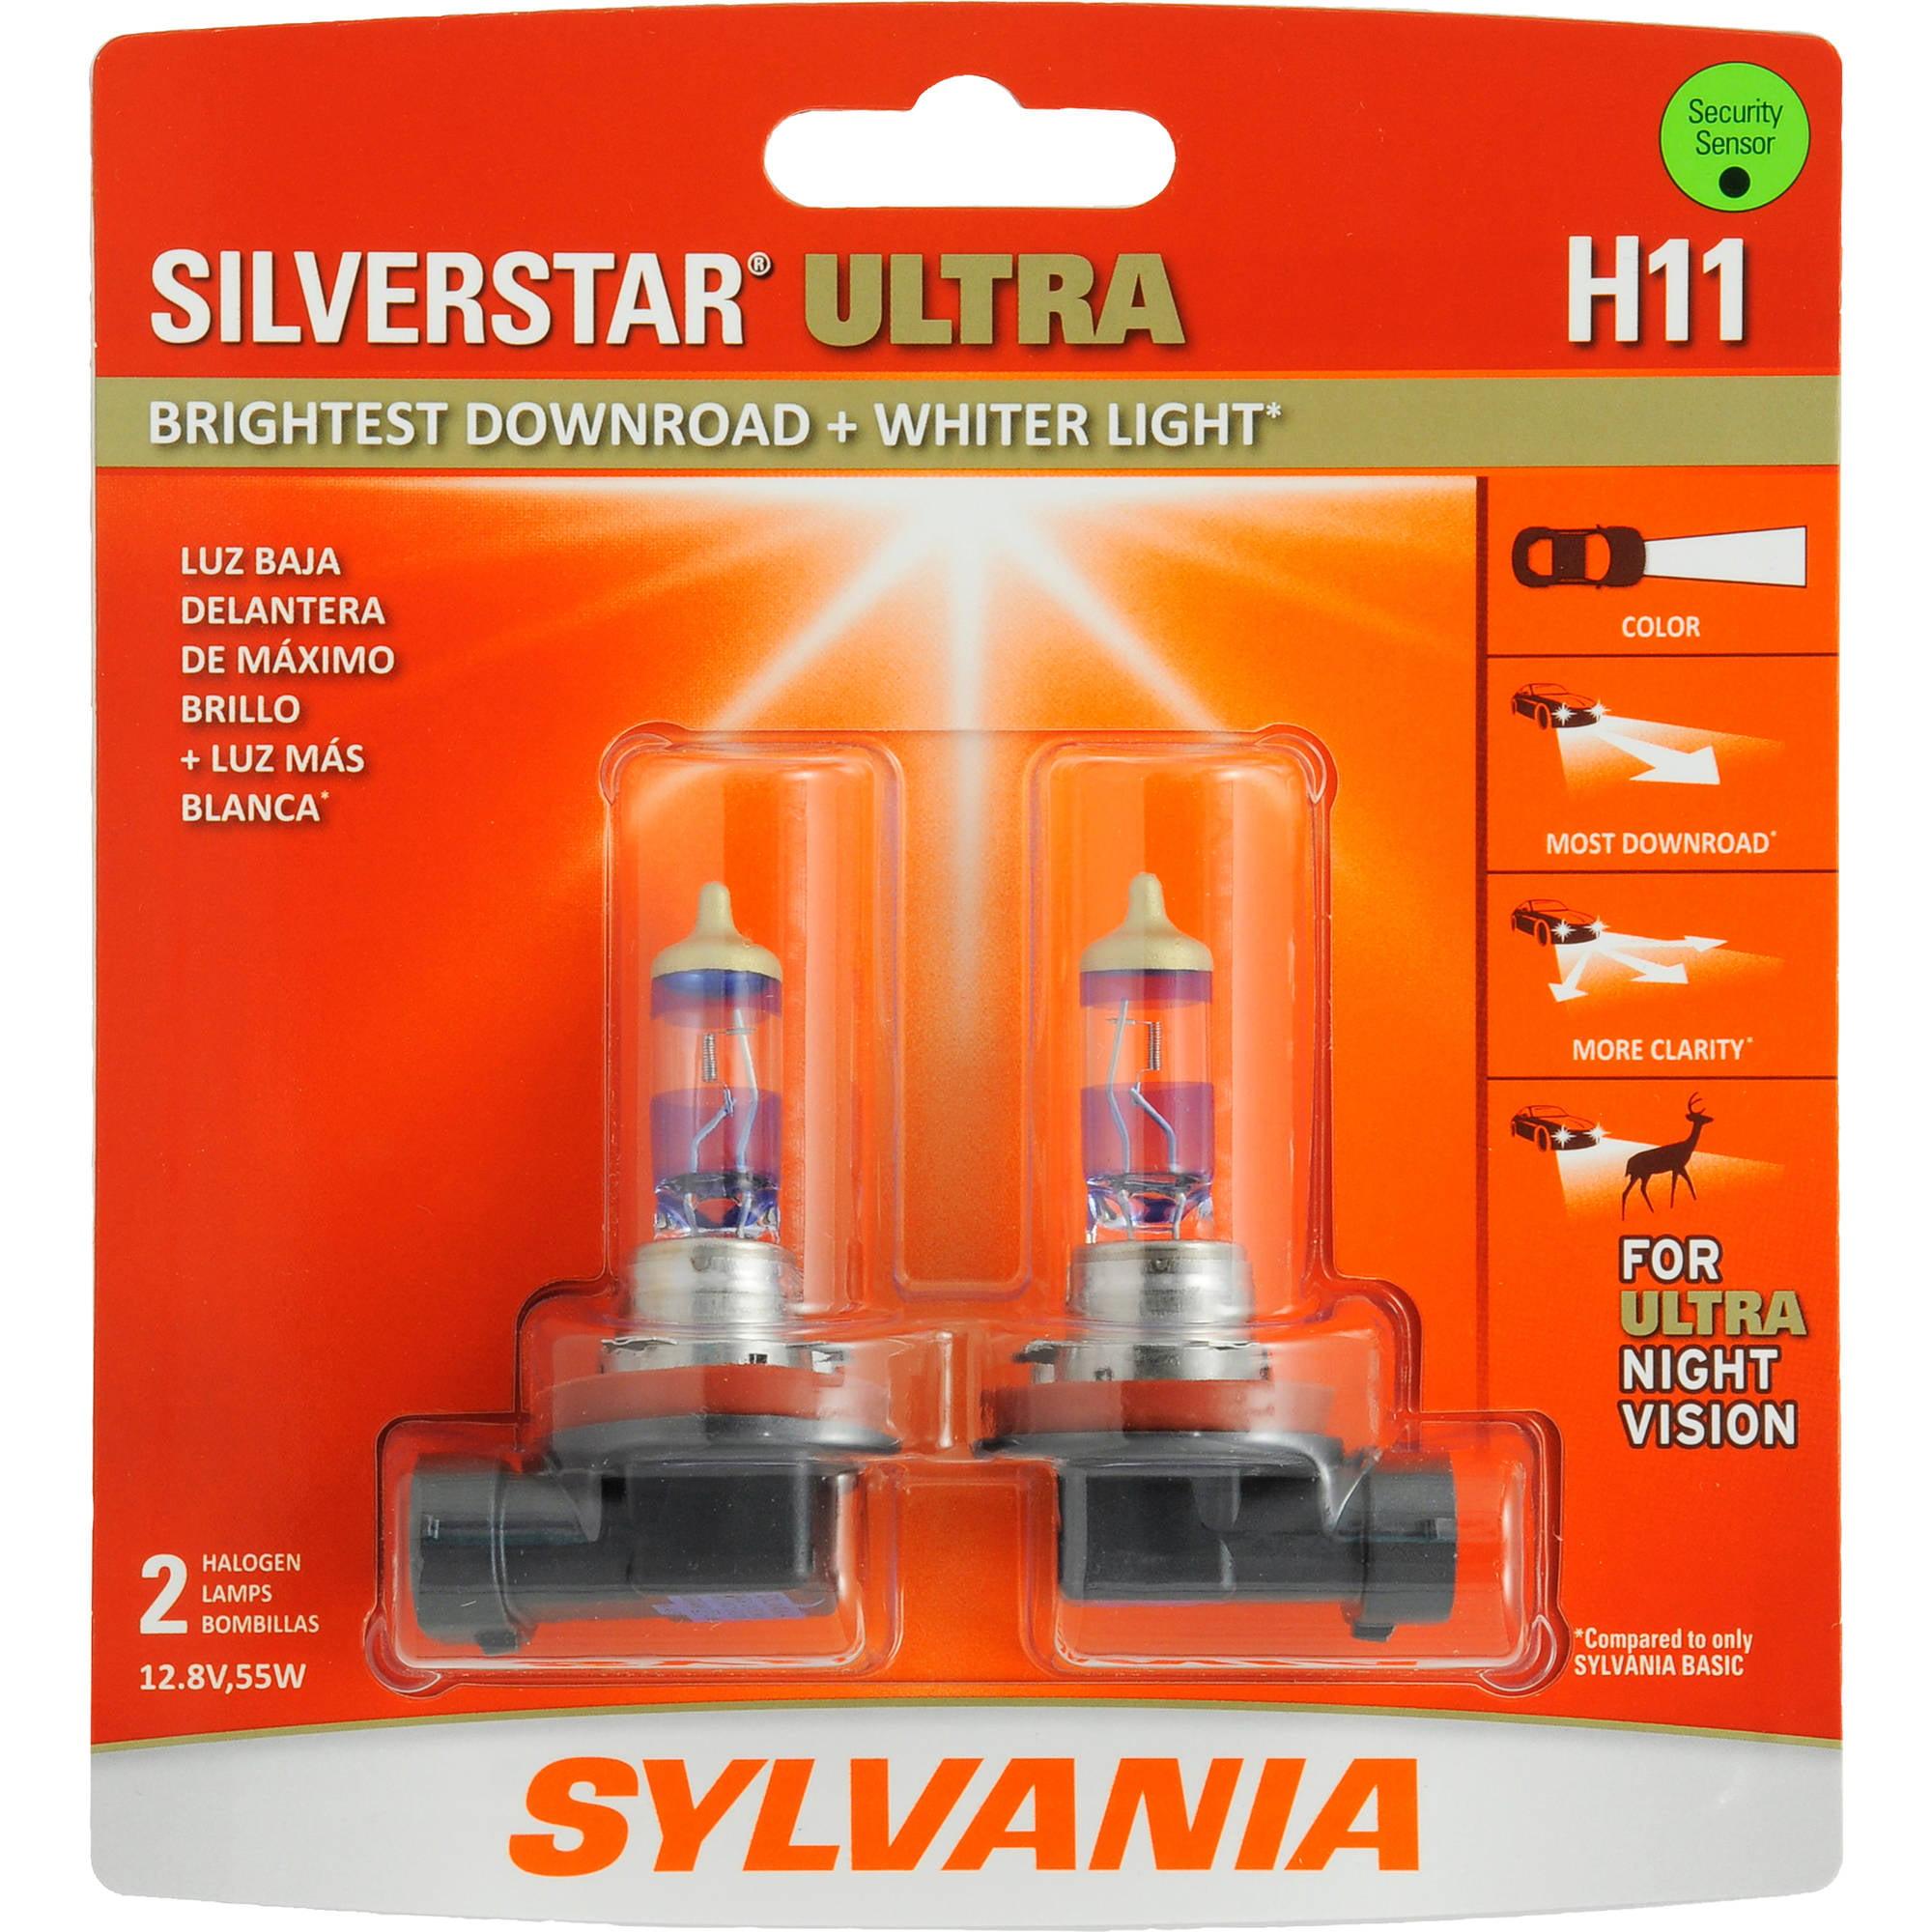 Sylvania H11 SilverStar ULTRA Headlight, Contains 2 Bulbs